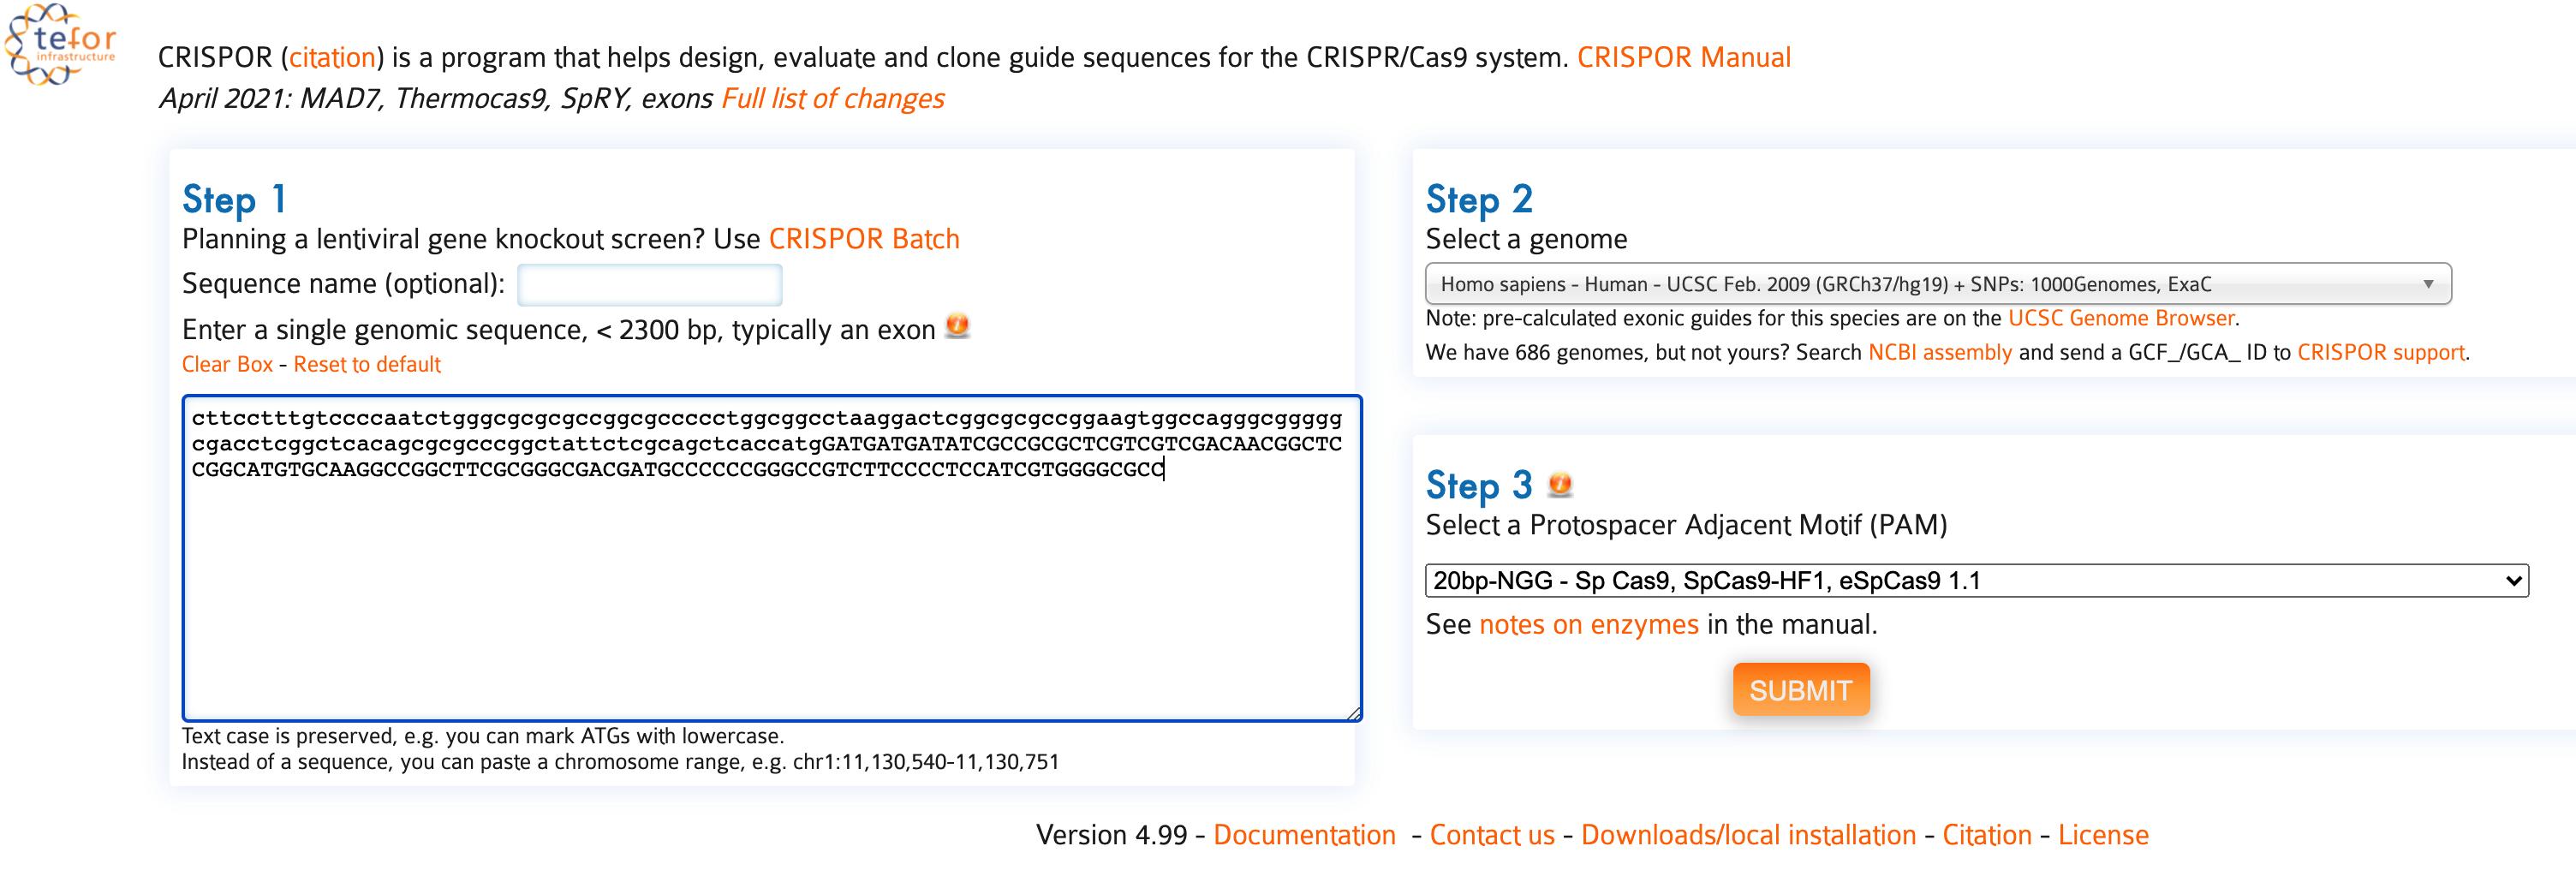 CRISPR 设计和Off Target预测:tefor